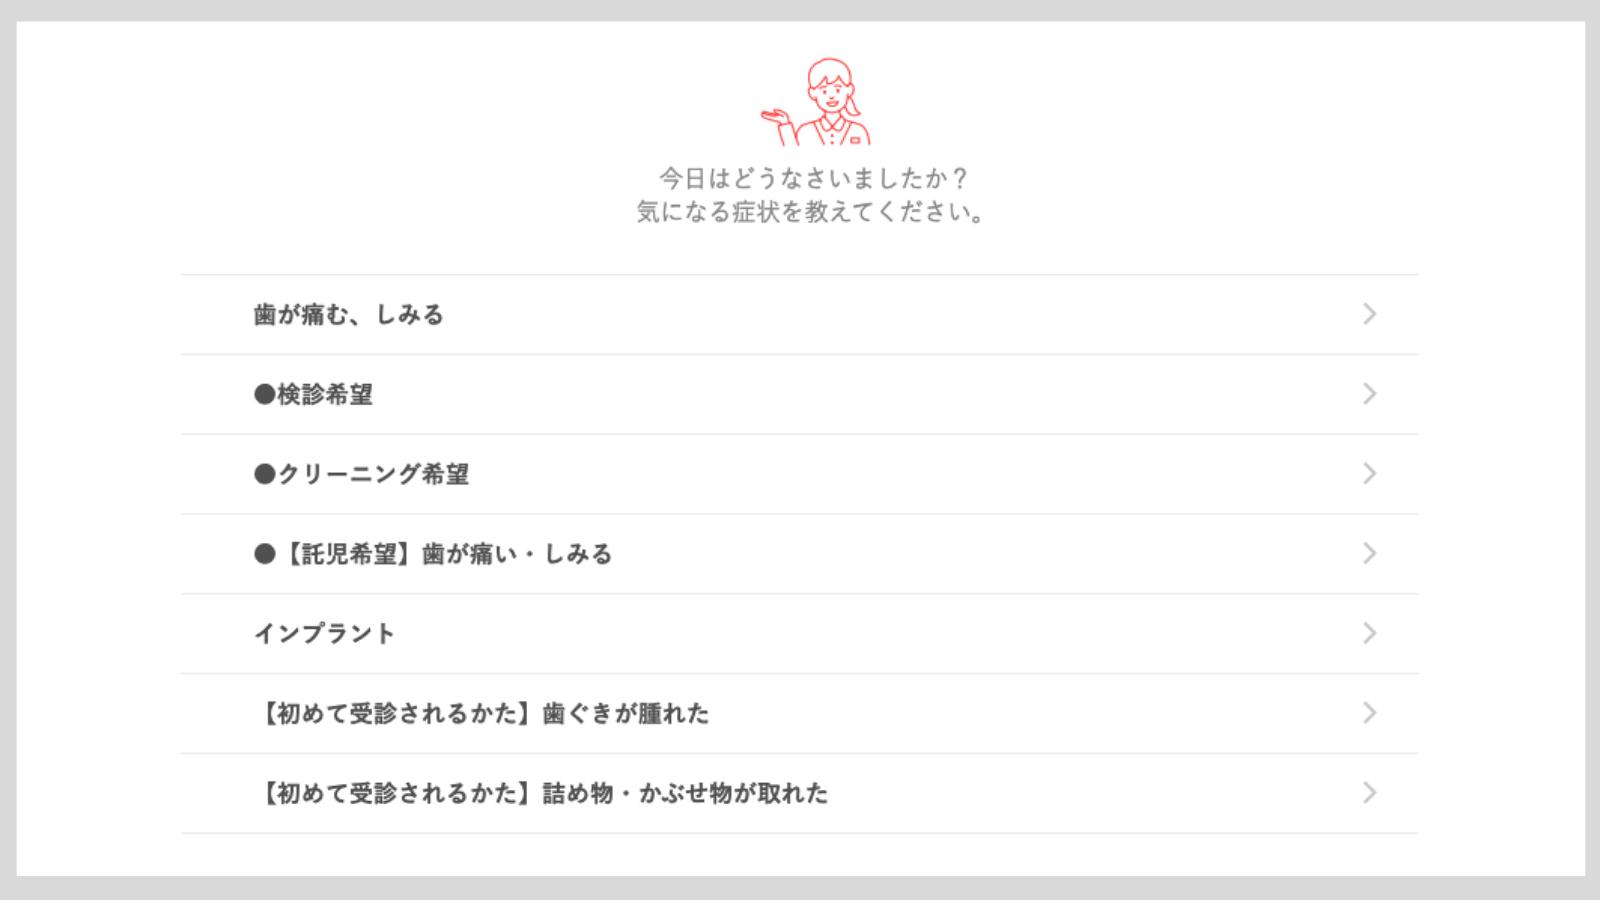 DXレポート WEB予約 ネット予約